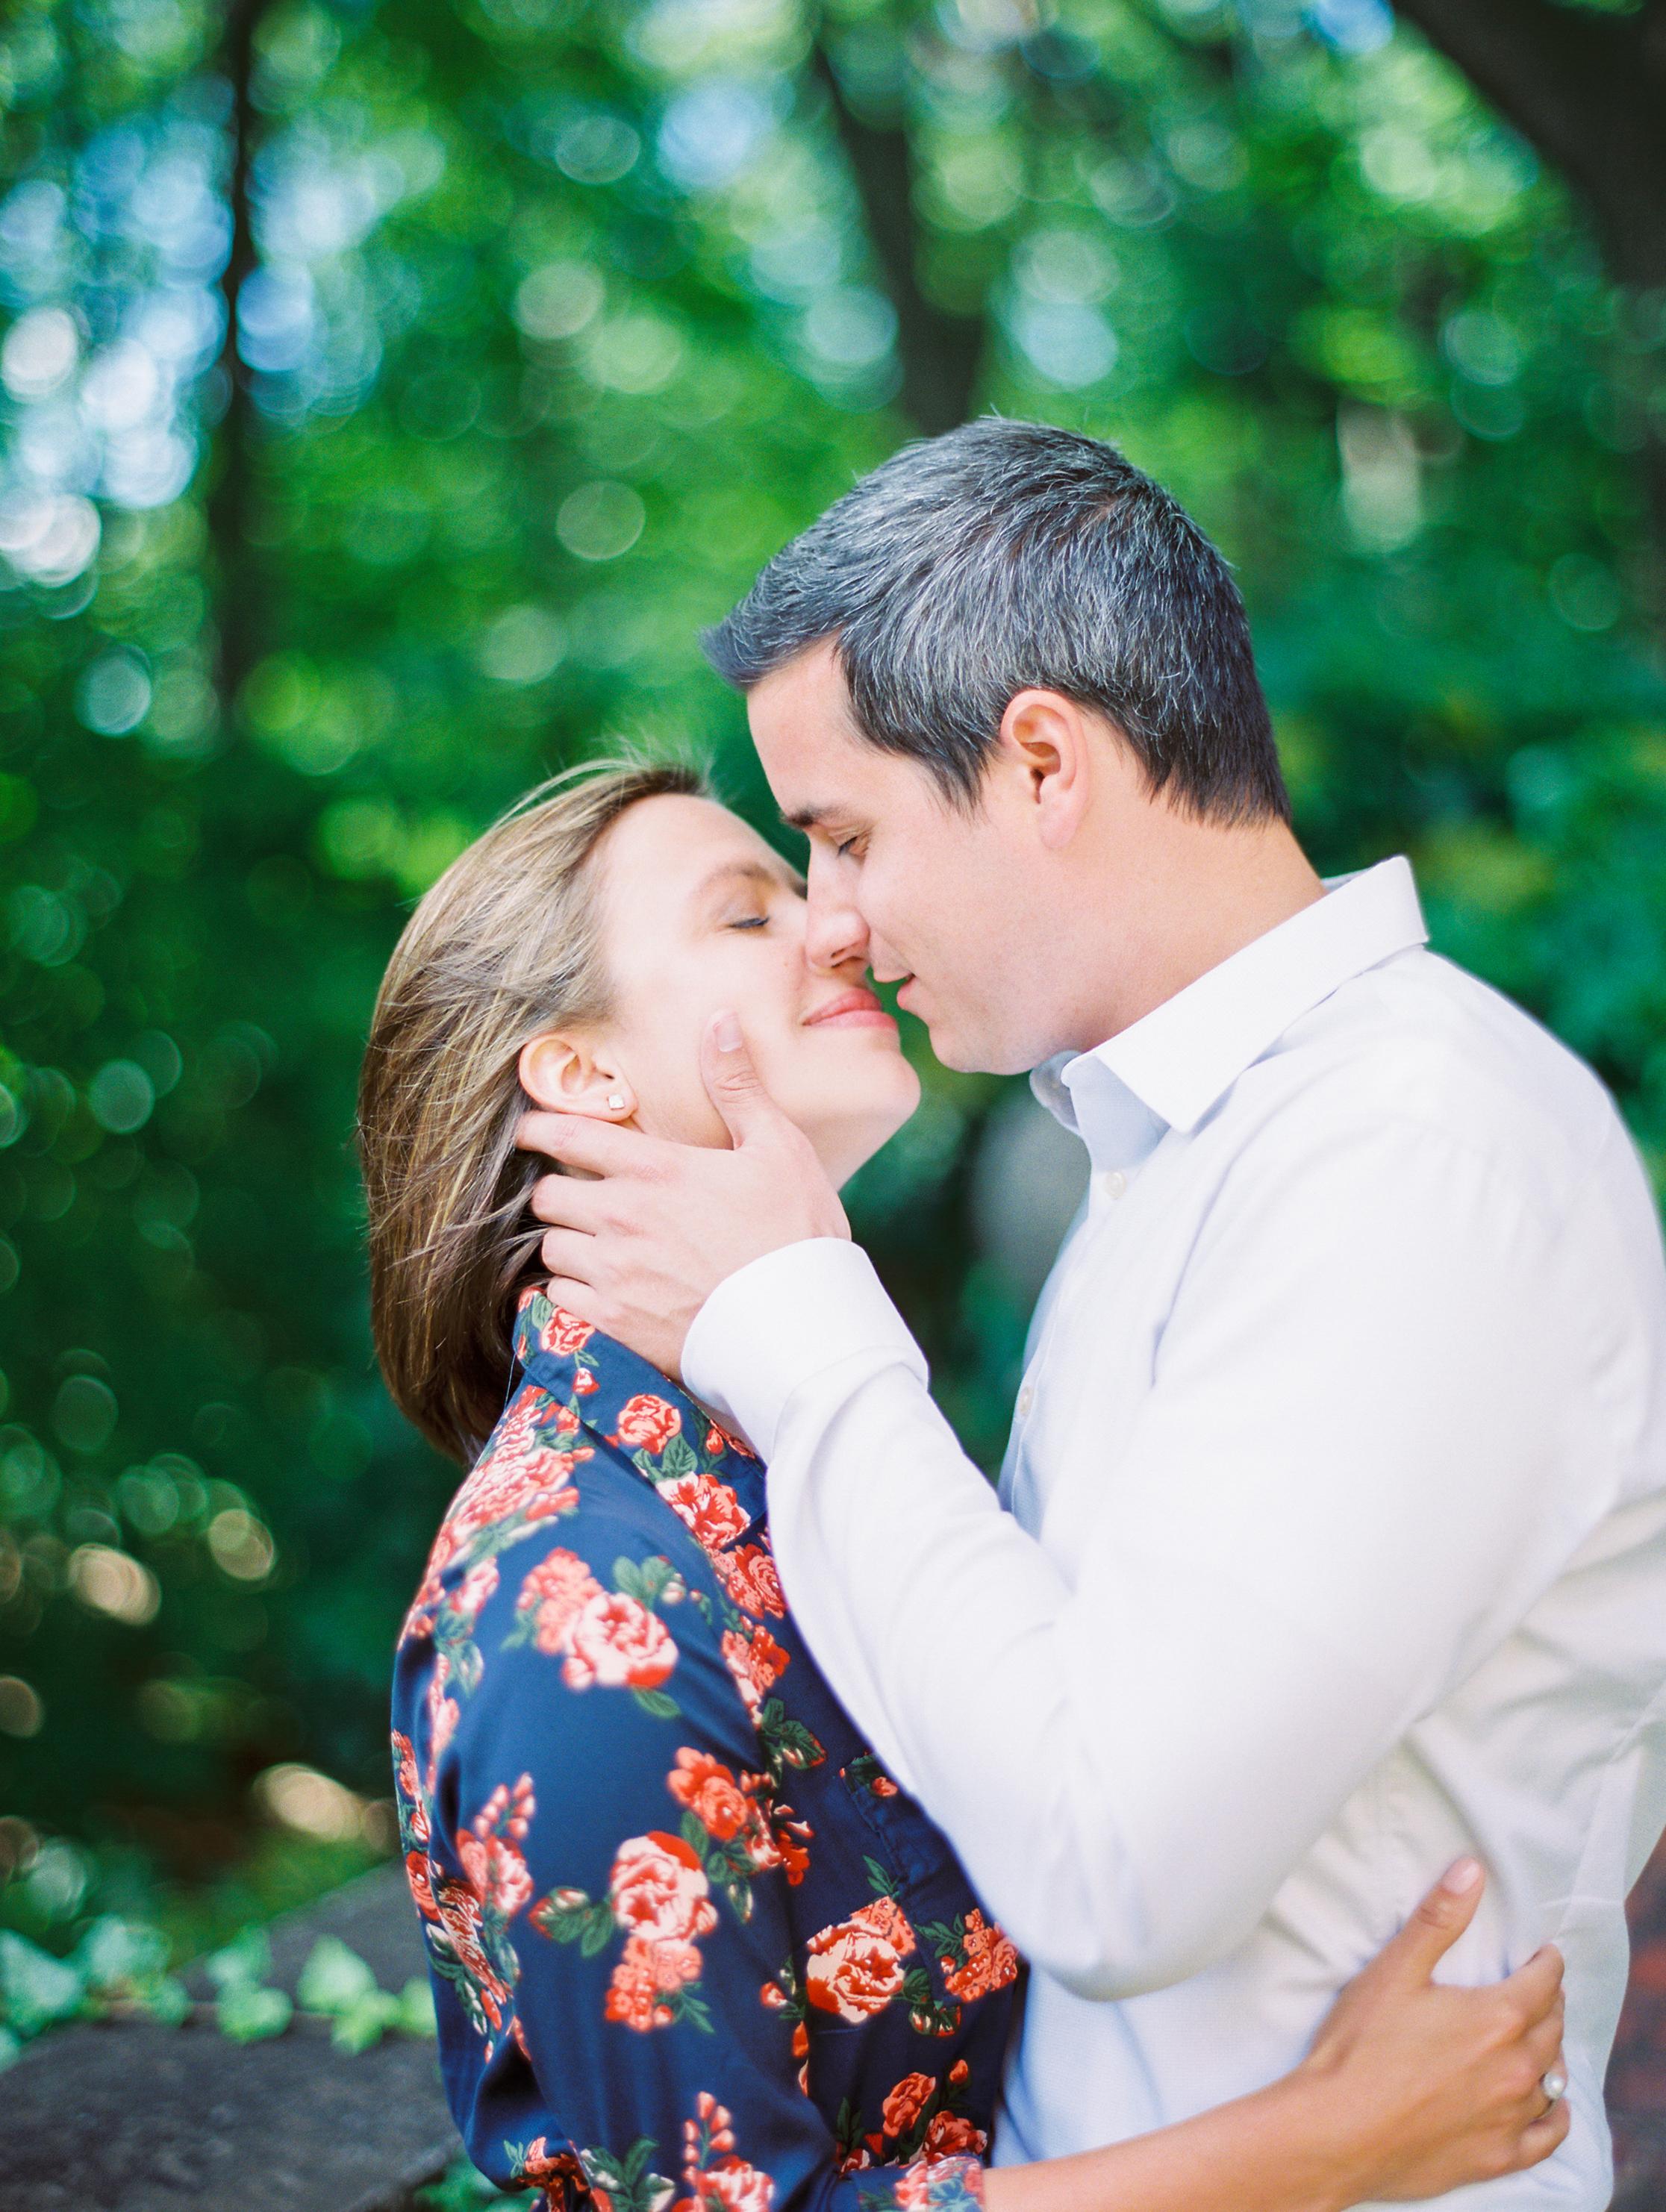 Erica+Jackson+Grand+Rapids+Engagement-69.jpg